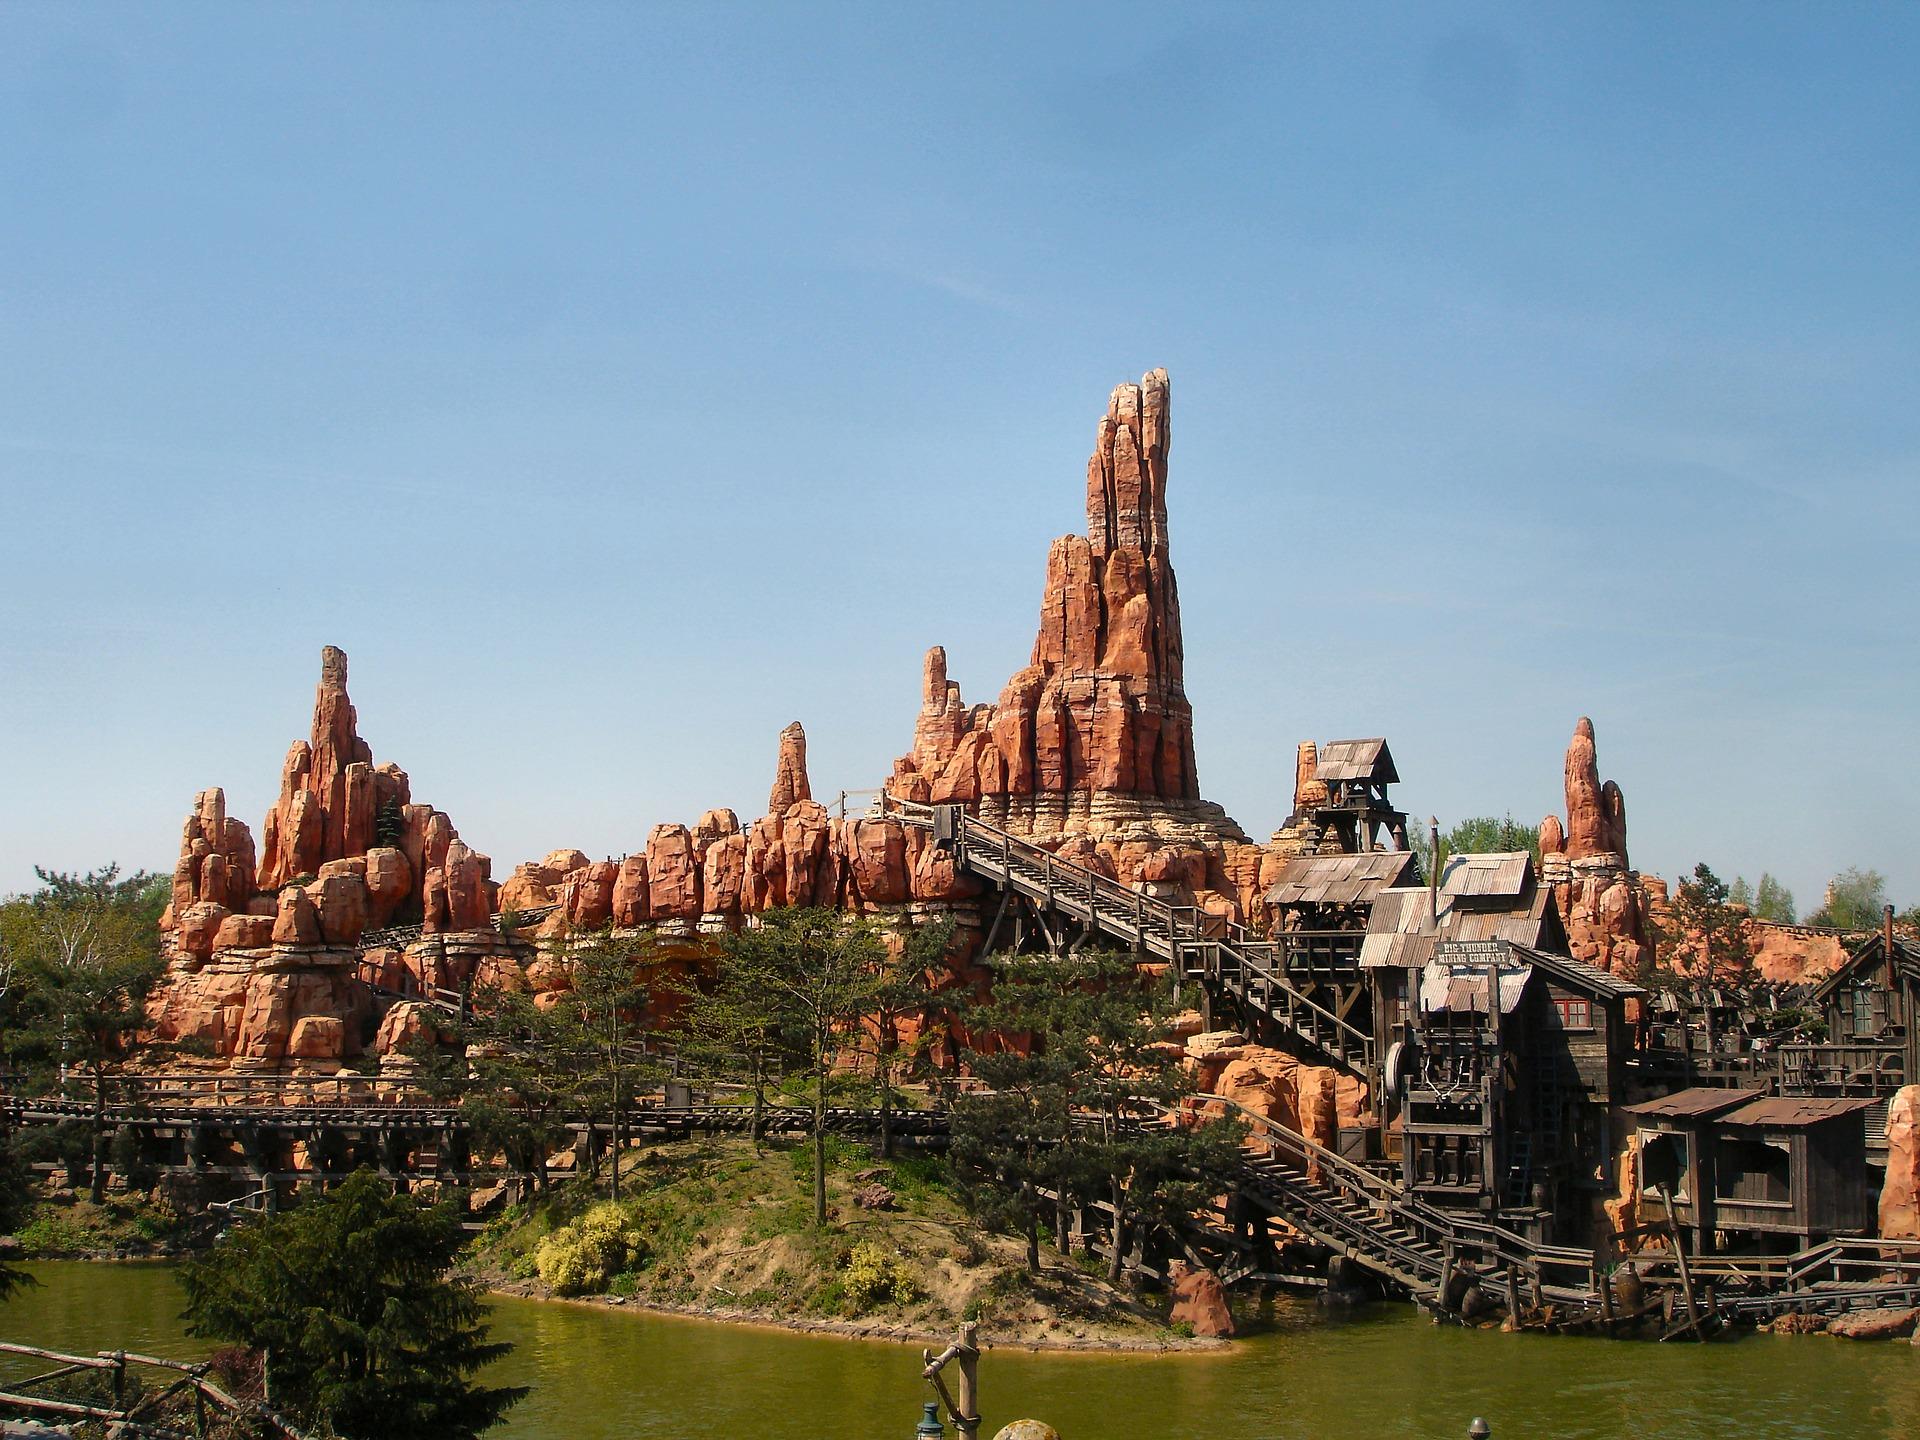 Disneyland Frontierland